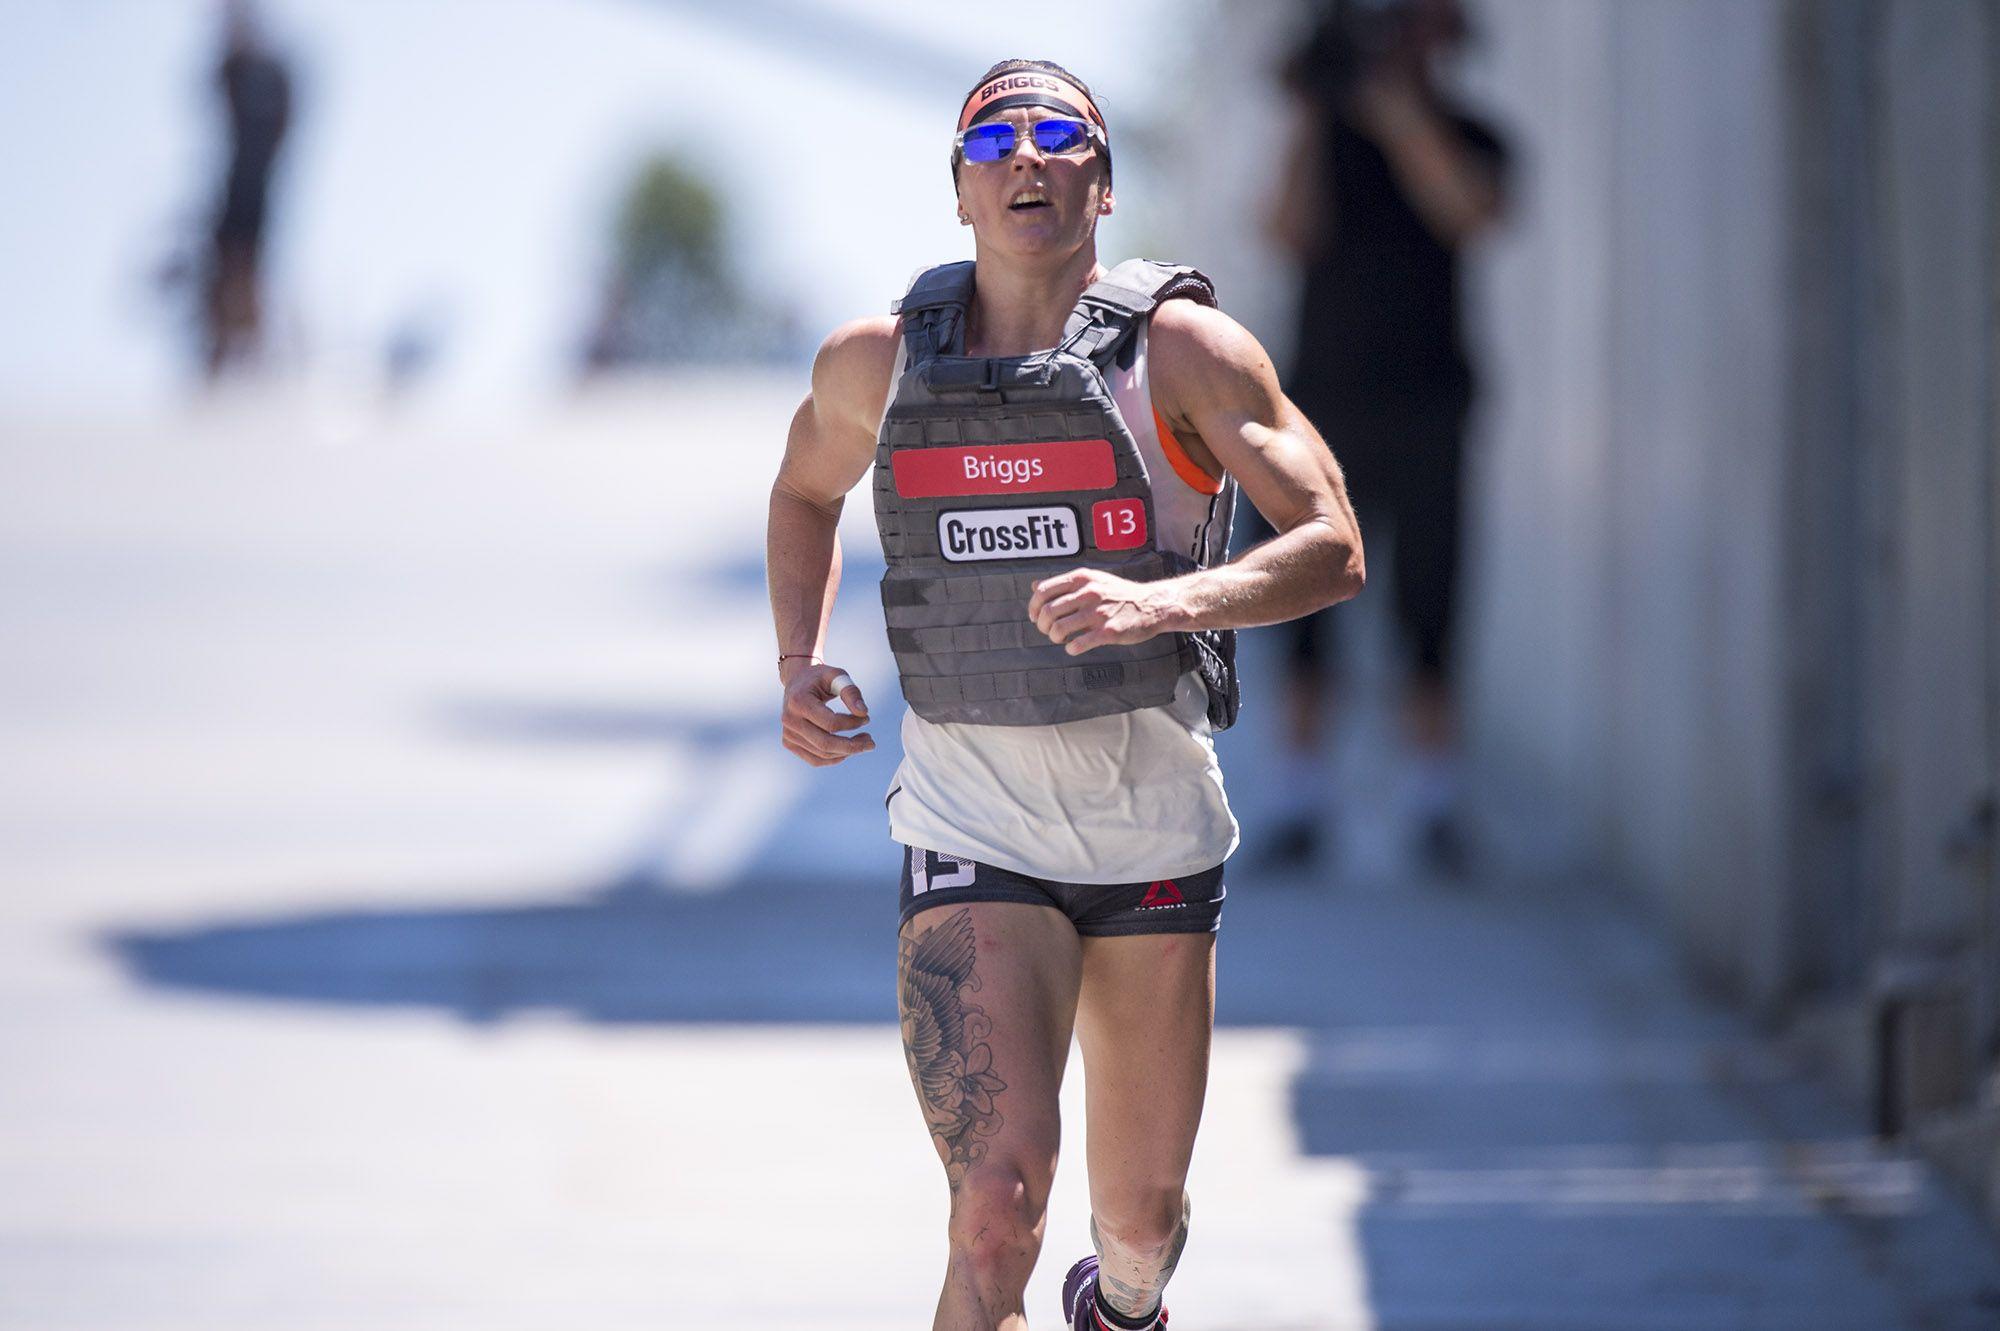 Photo: CrossFit Inc